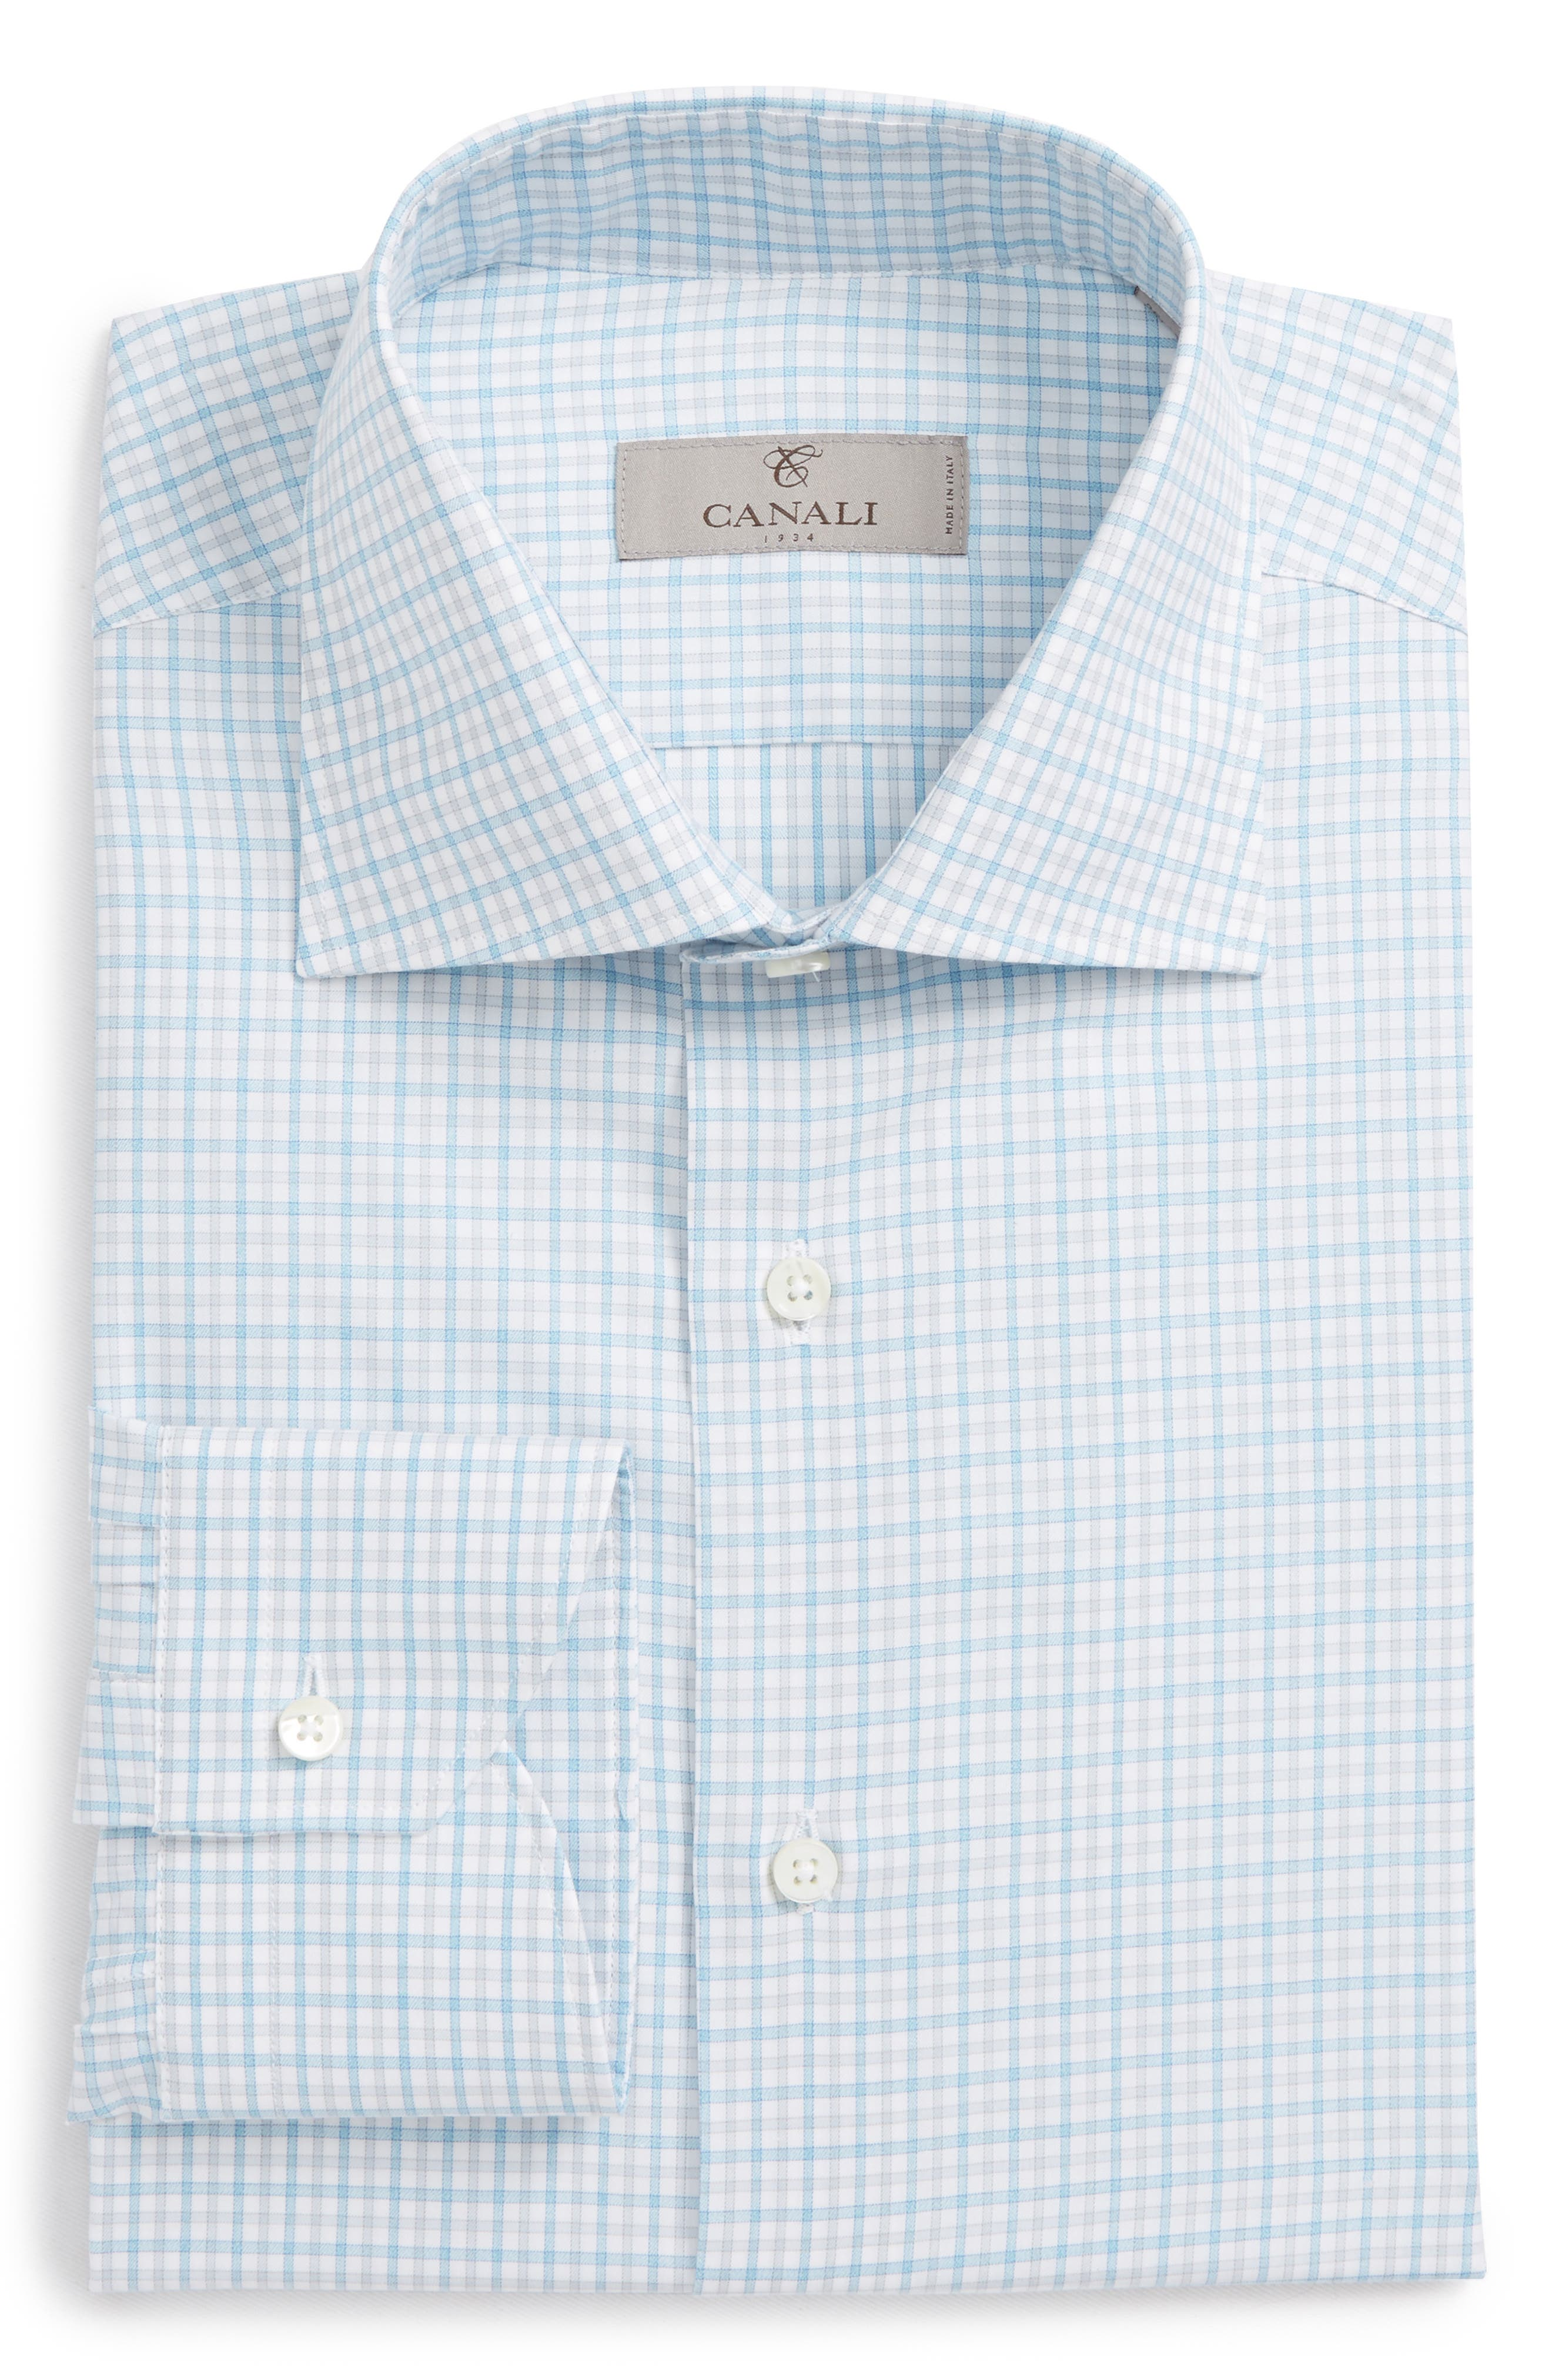 Regular Fit Check Dress Shirt,                             Alternate thumbnail 5, color,                             440